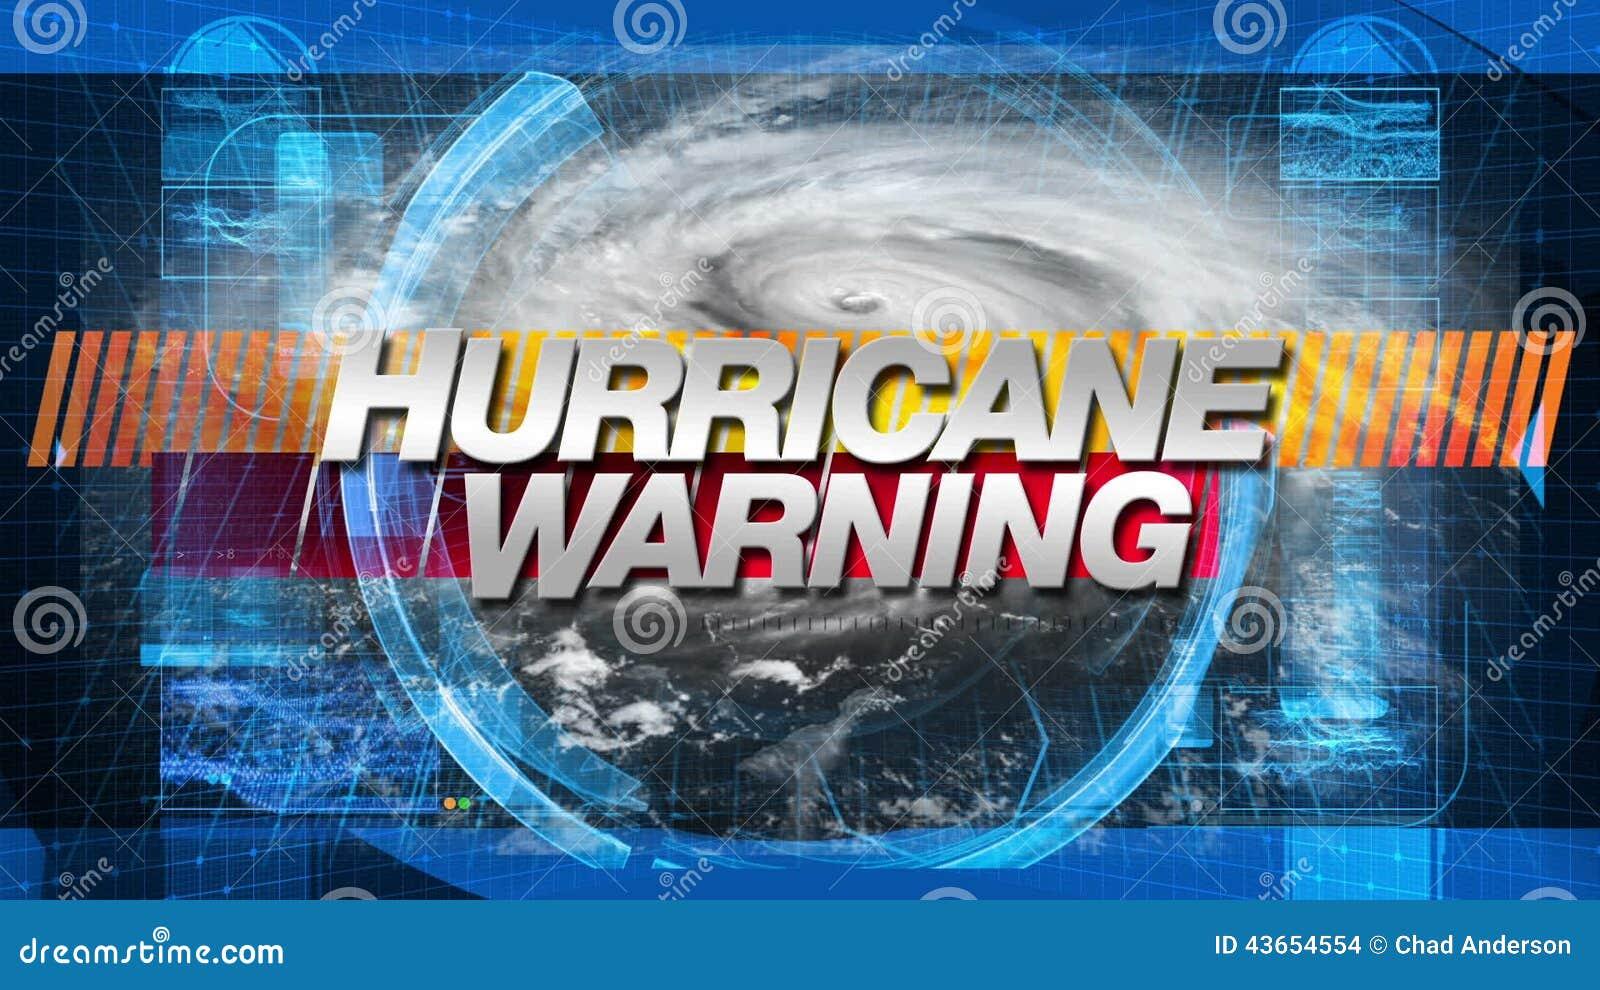 South Florida under hurricane warning as Irma approaches | WeatherPlus